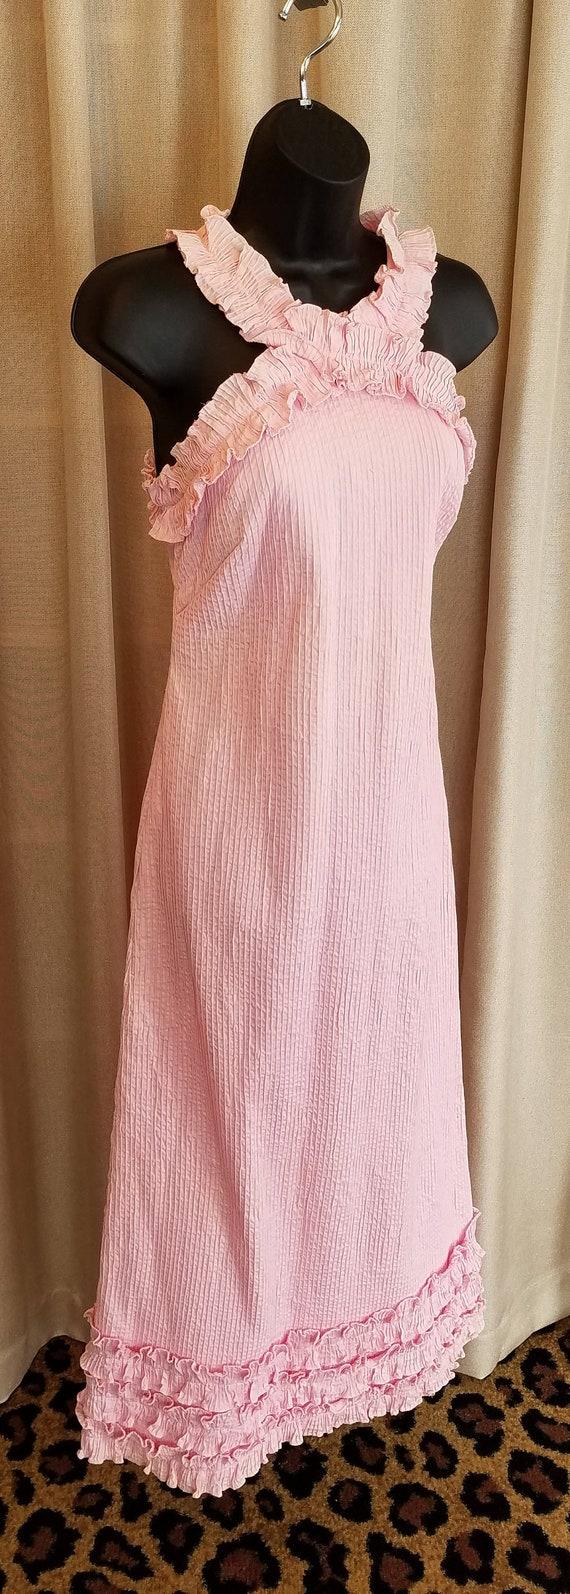 Vintage, 1960s, 60s, Estevez, Dress, Pink, Pintuck